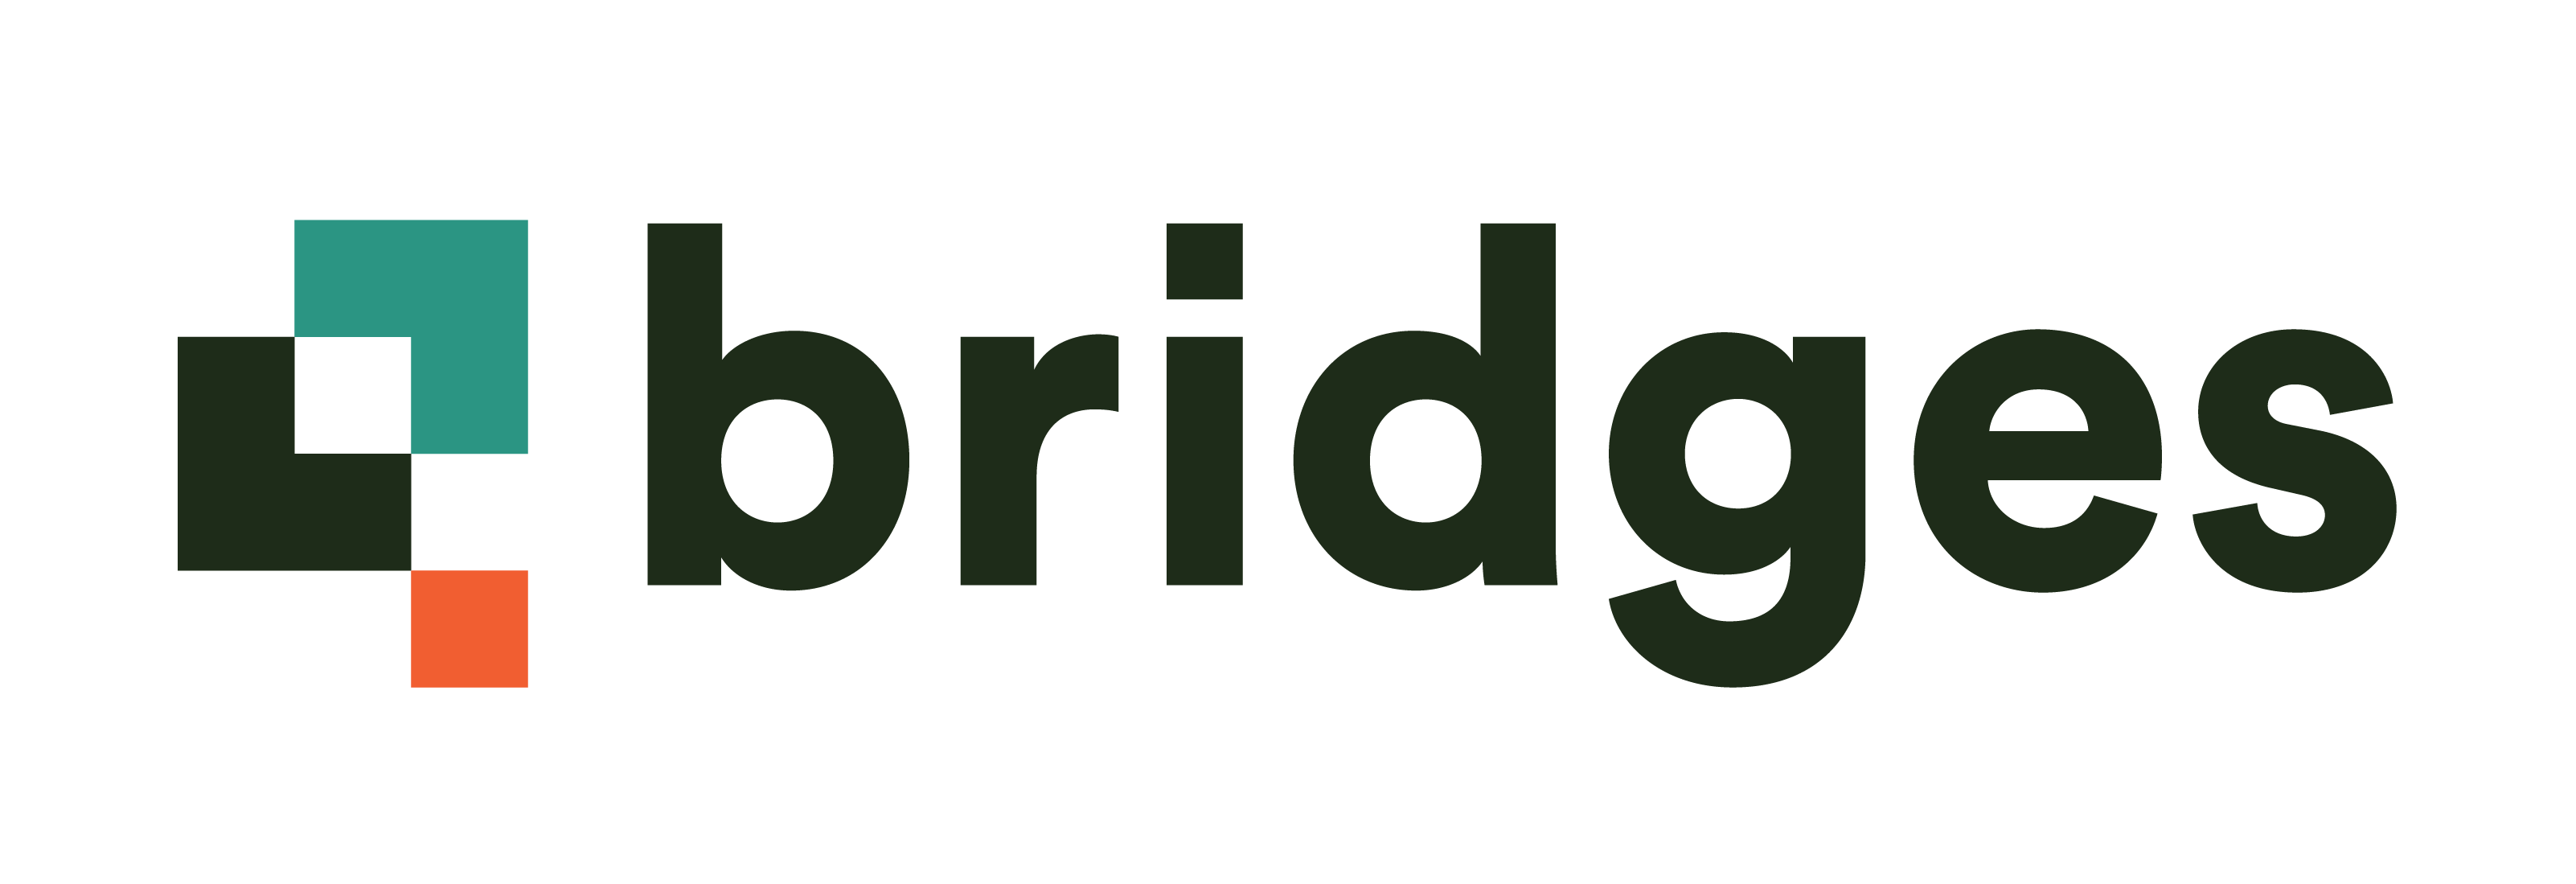 Bridges dark logo sized